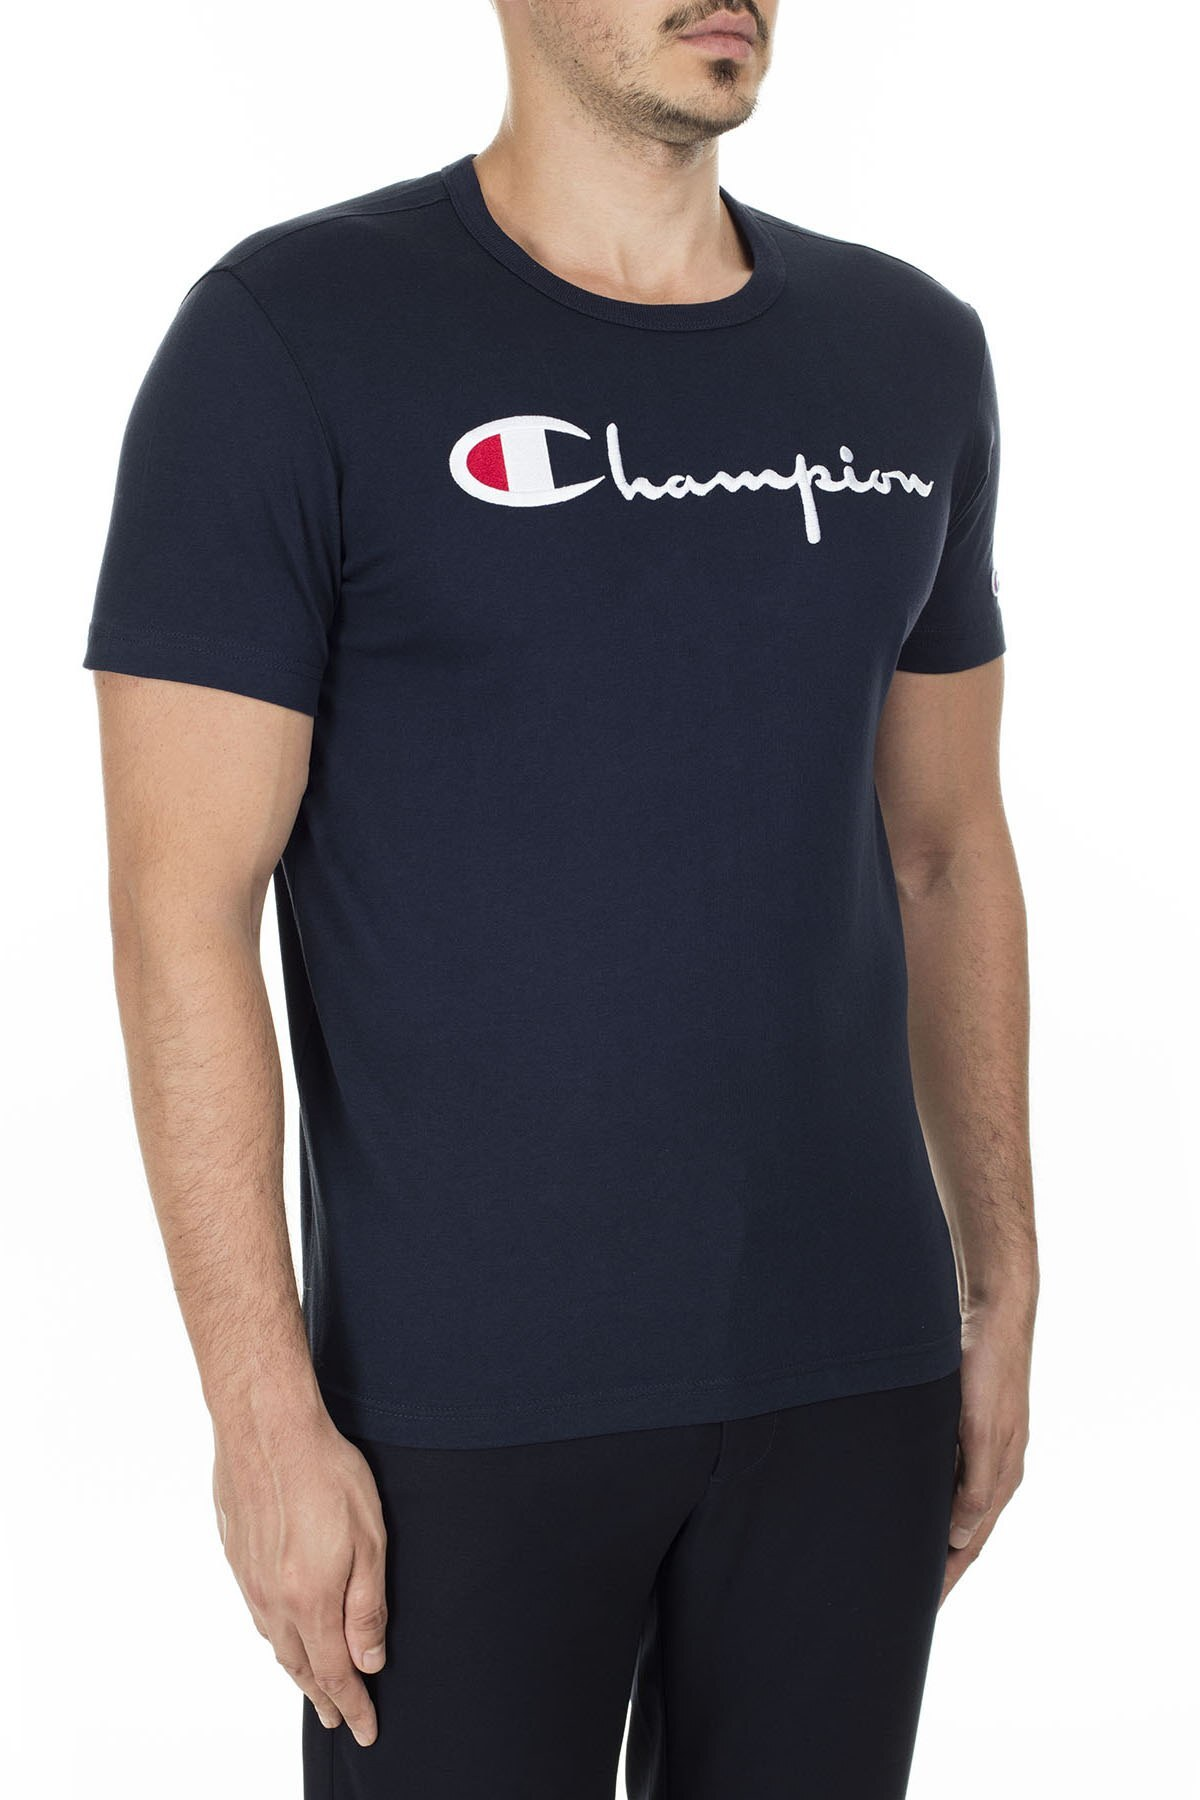 Champion İşlemeli Yazı Logolu Bisiklet Yaka Erkek T Shirt 210972 BS501 NNY LACİVERT